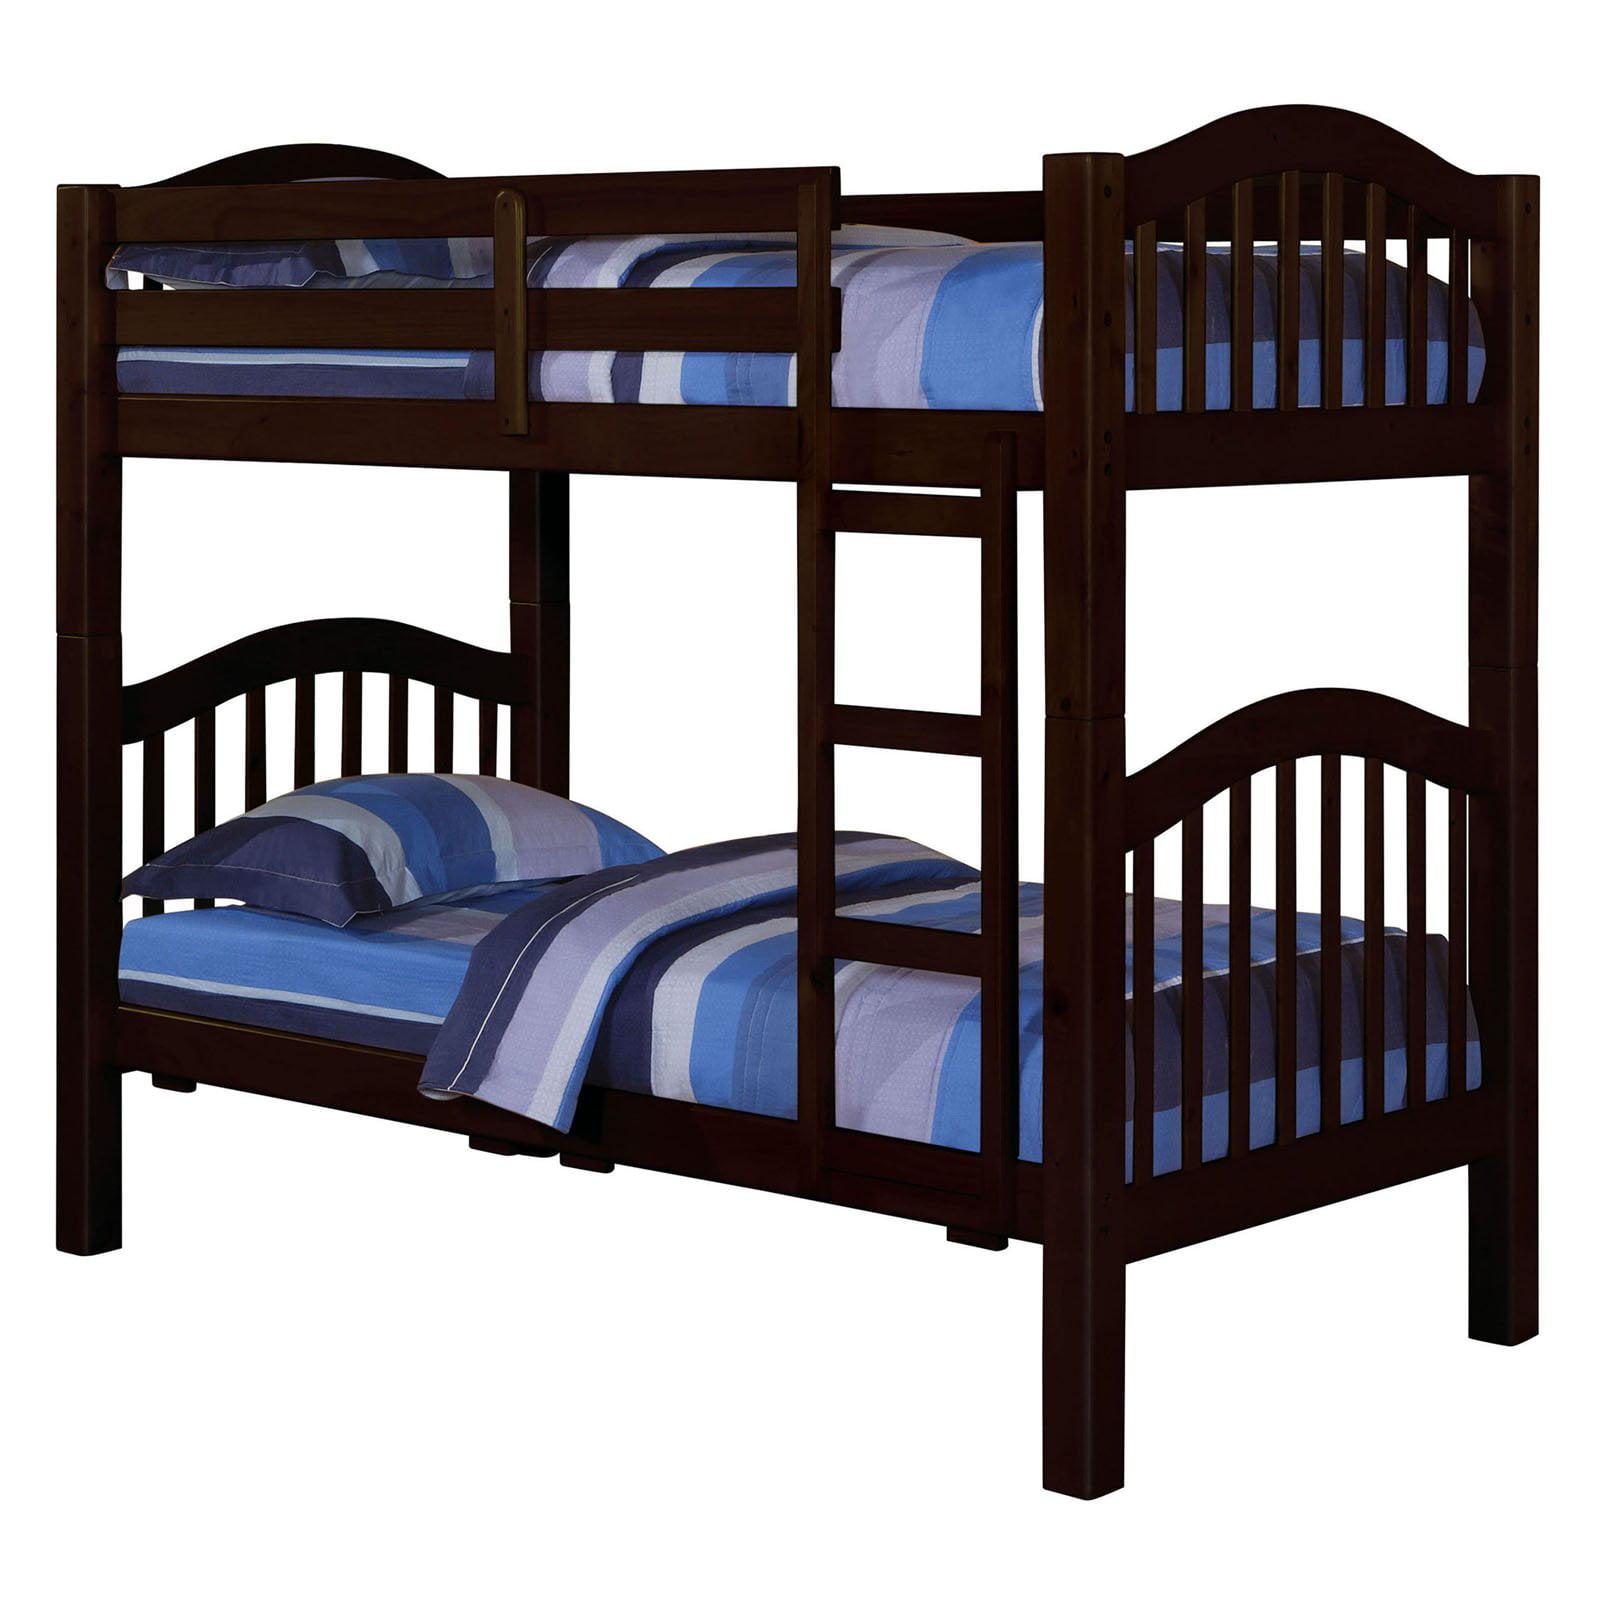 Acme Furniture Heartland Twin Over Twin Bunk Bed